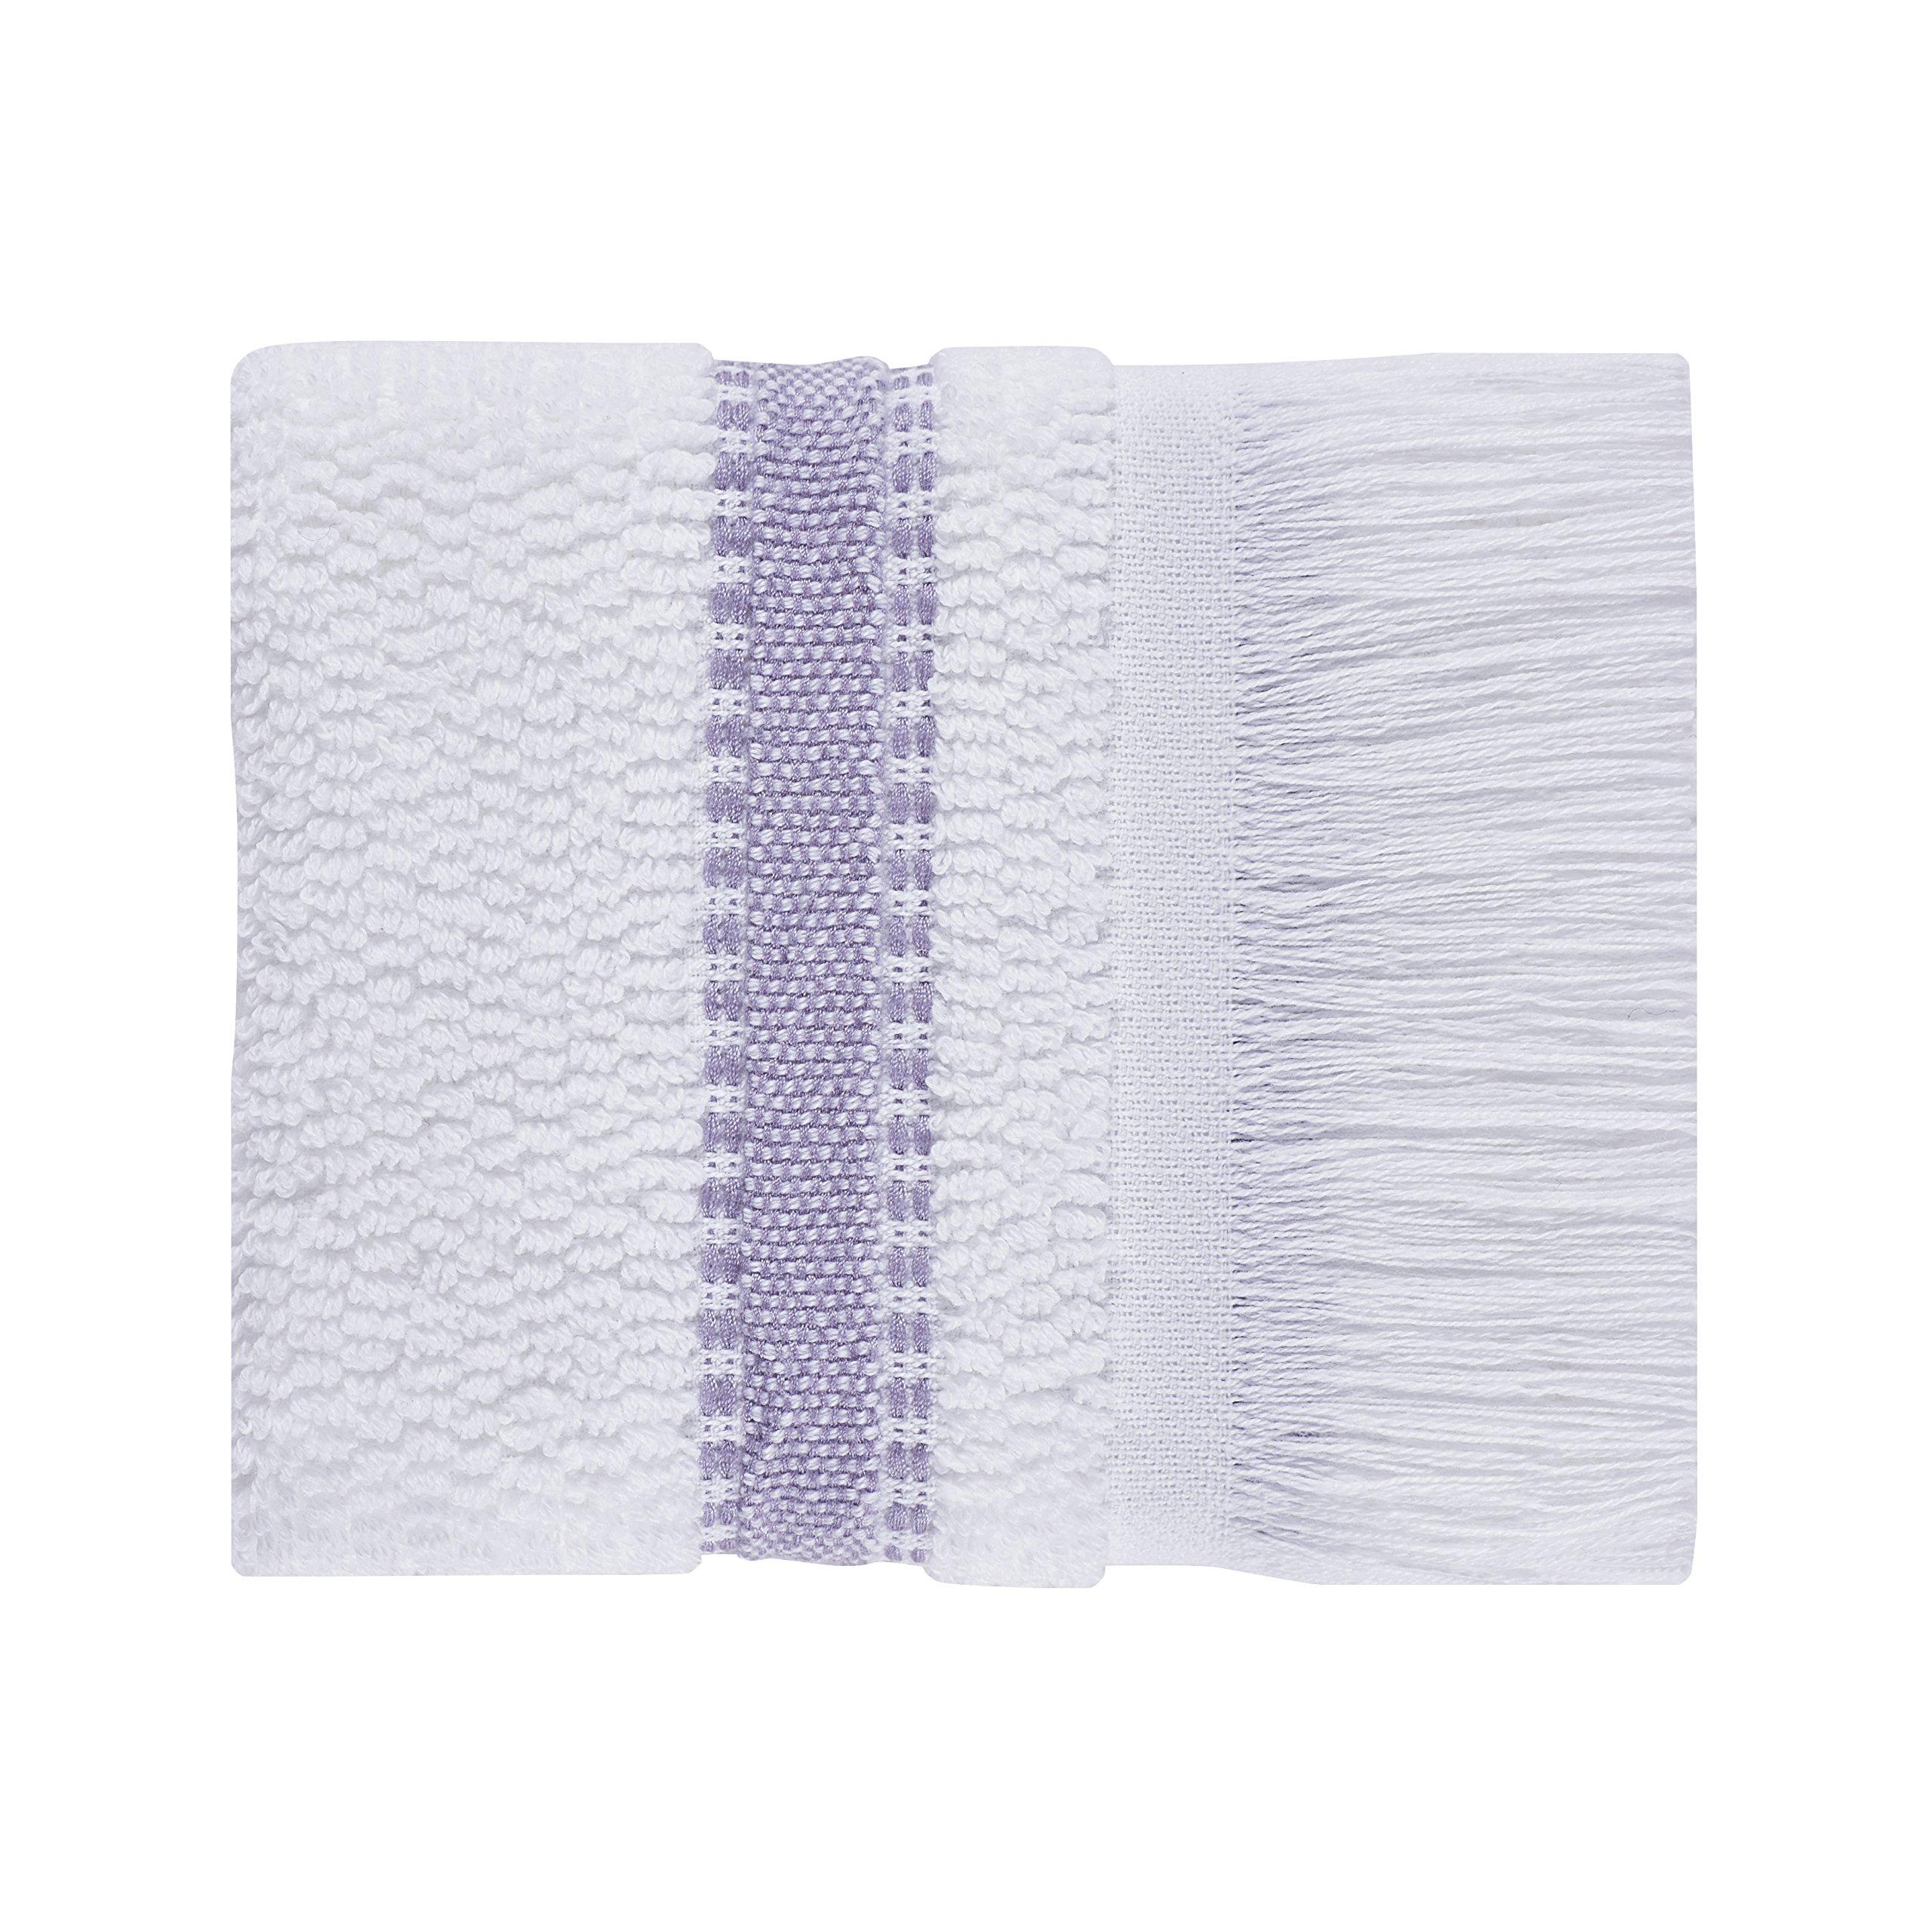 Five Queens Court Laney 100% Cotton Jacquard Ombre Stripe Wash Towel with Fringe, Fingertip, Purple